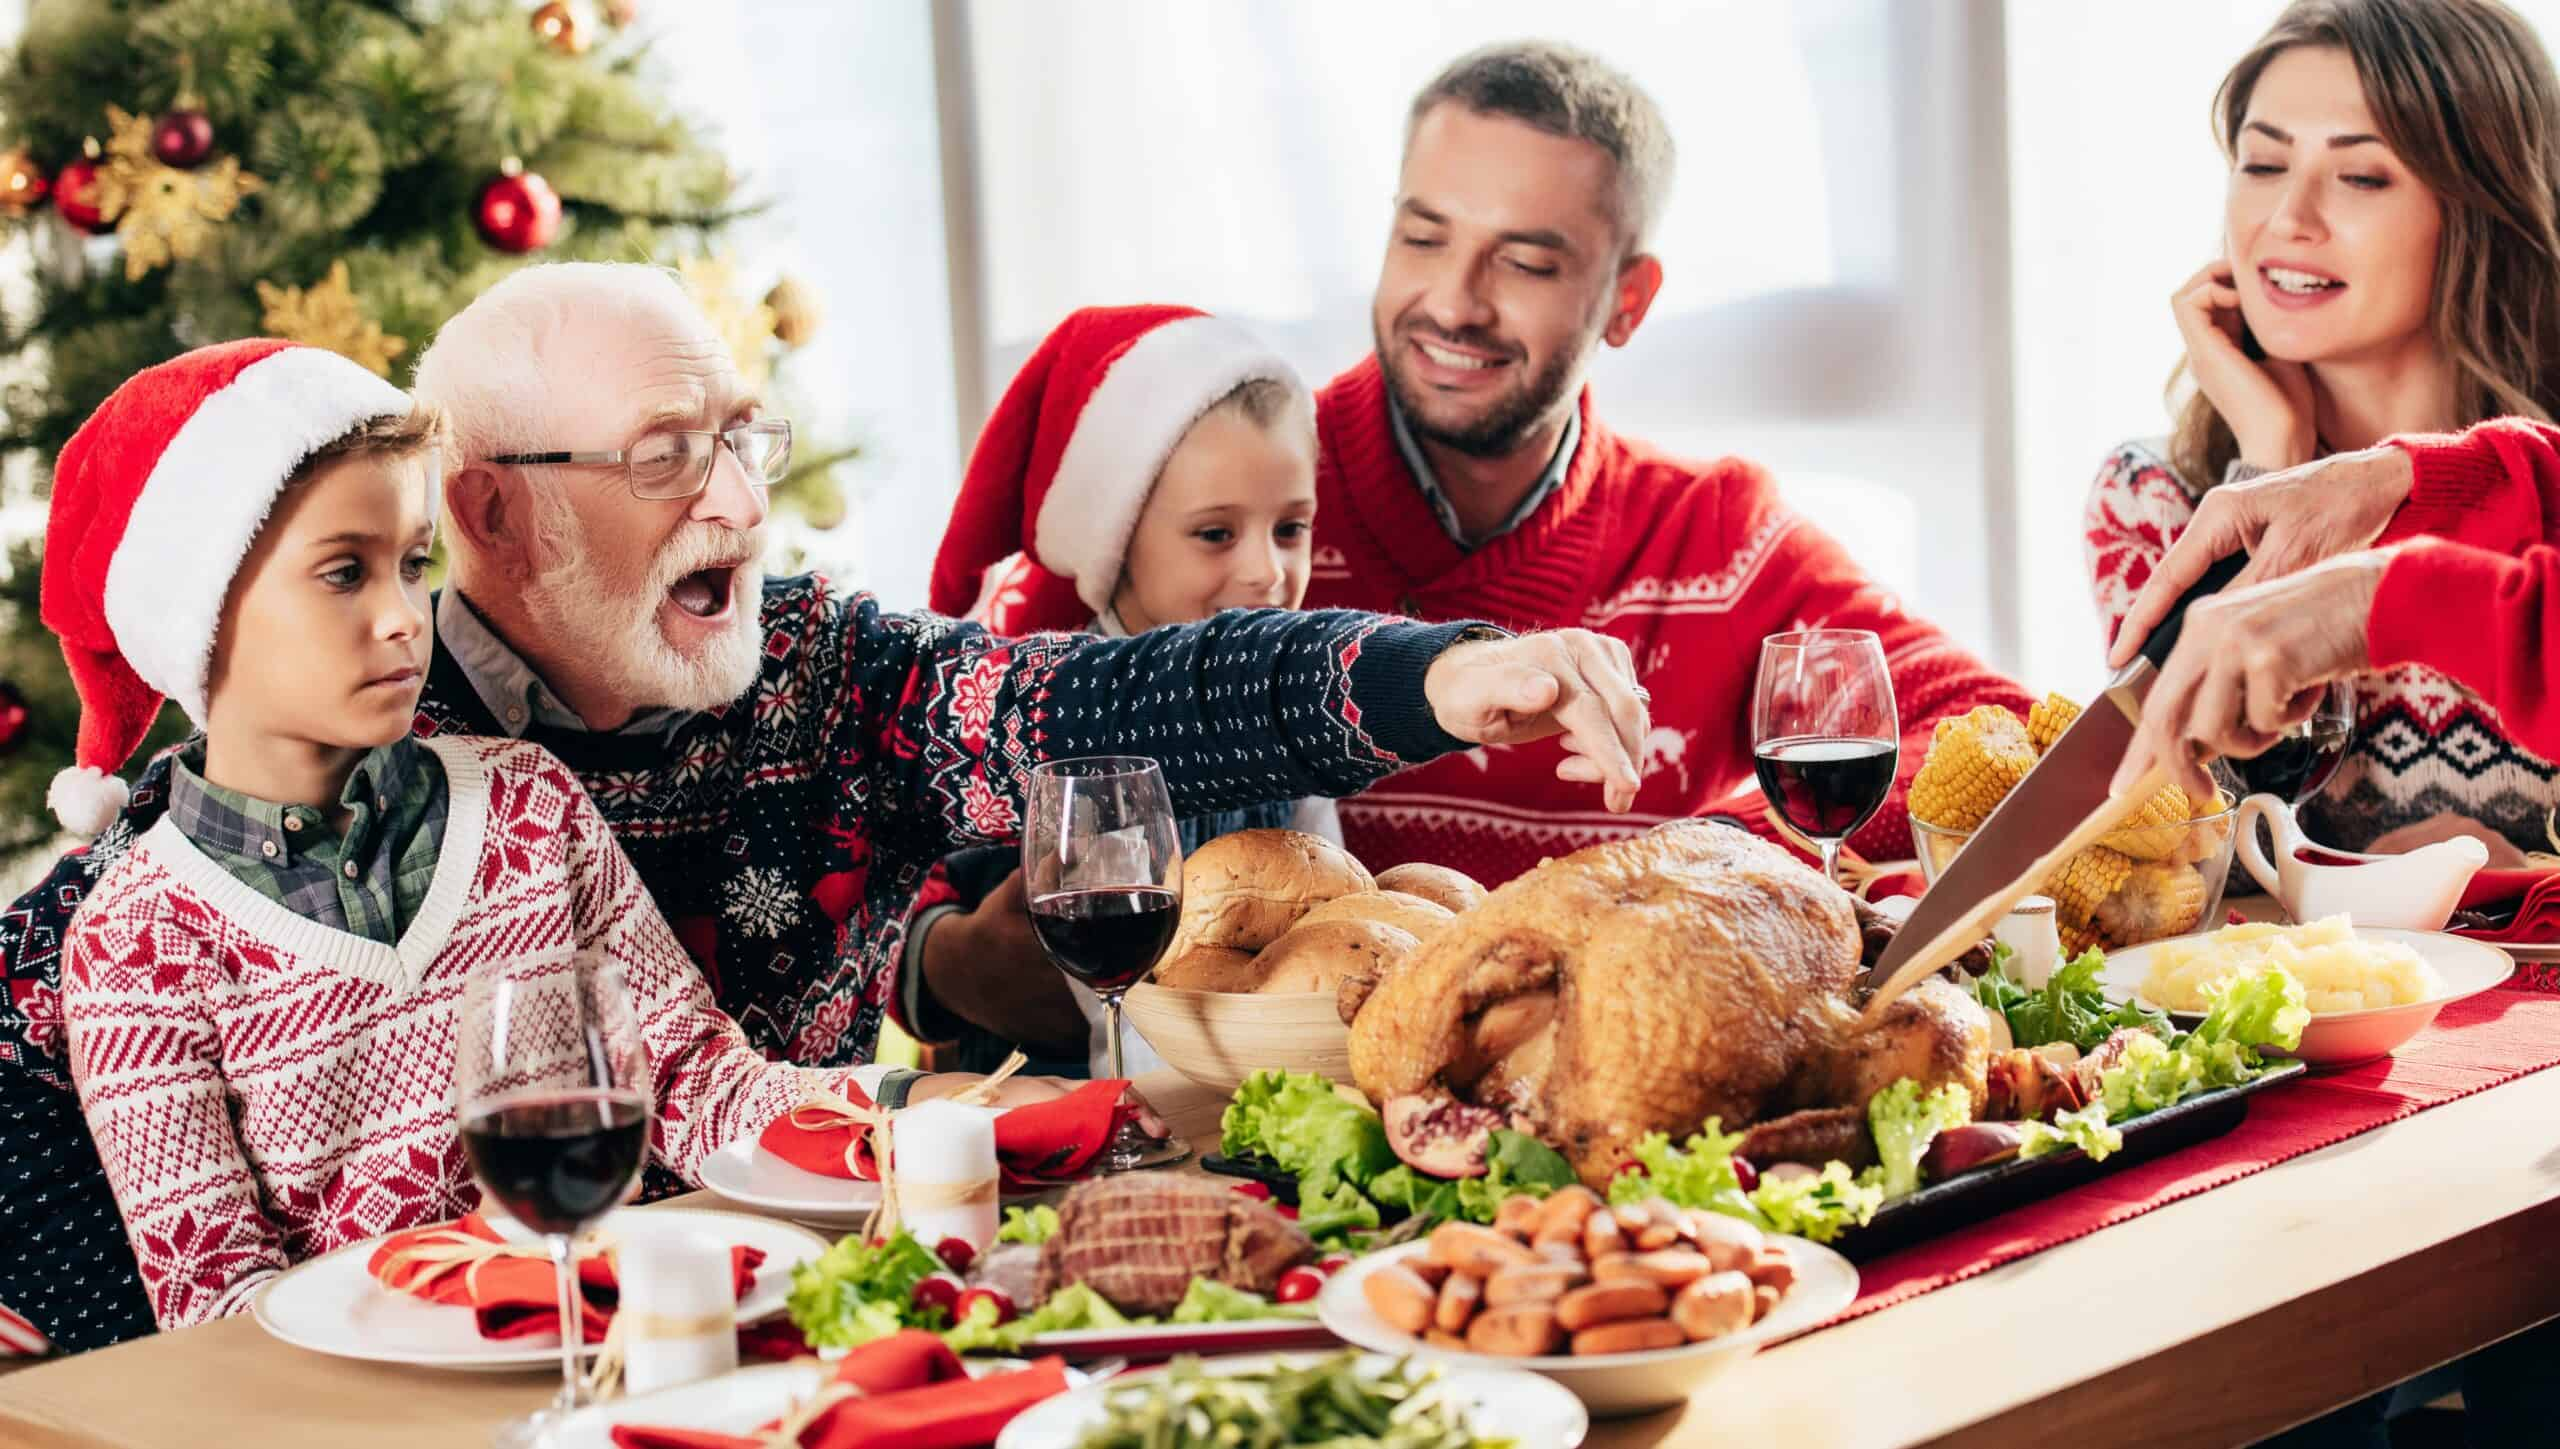 Restaurants Open Christmas Day In Orlando 2021 Christmas Dinner In Orlando 2020 Orlando Parents Family Fun Magazine